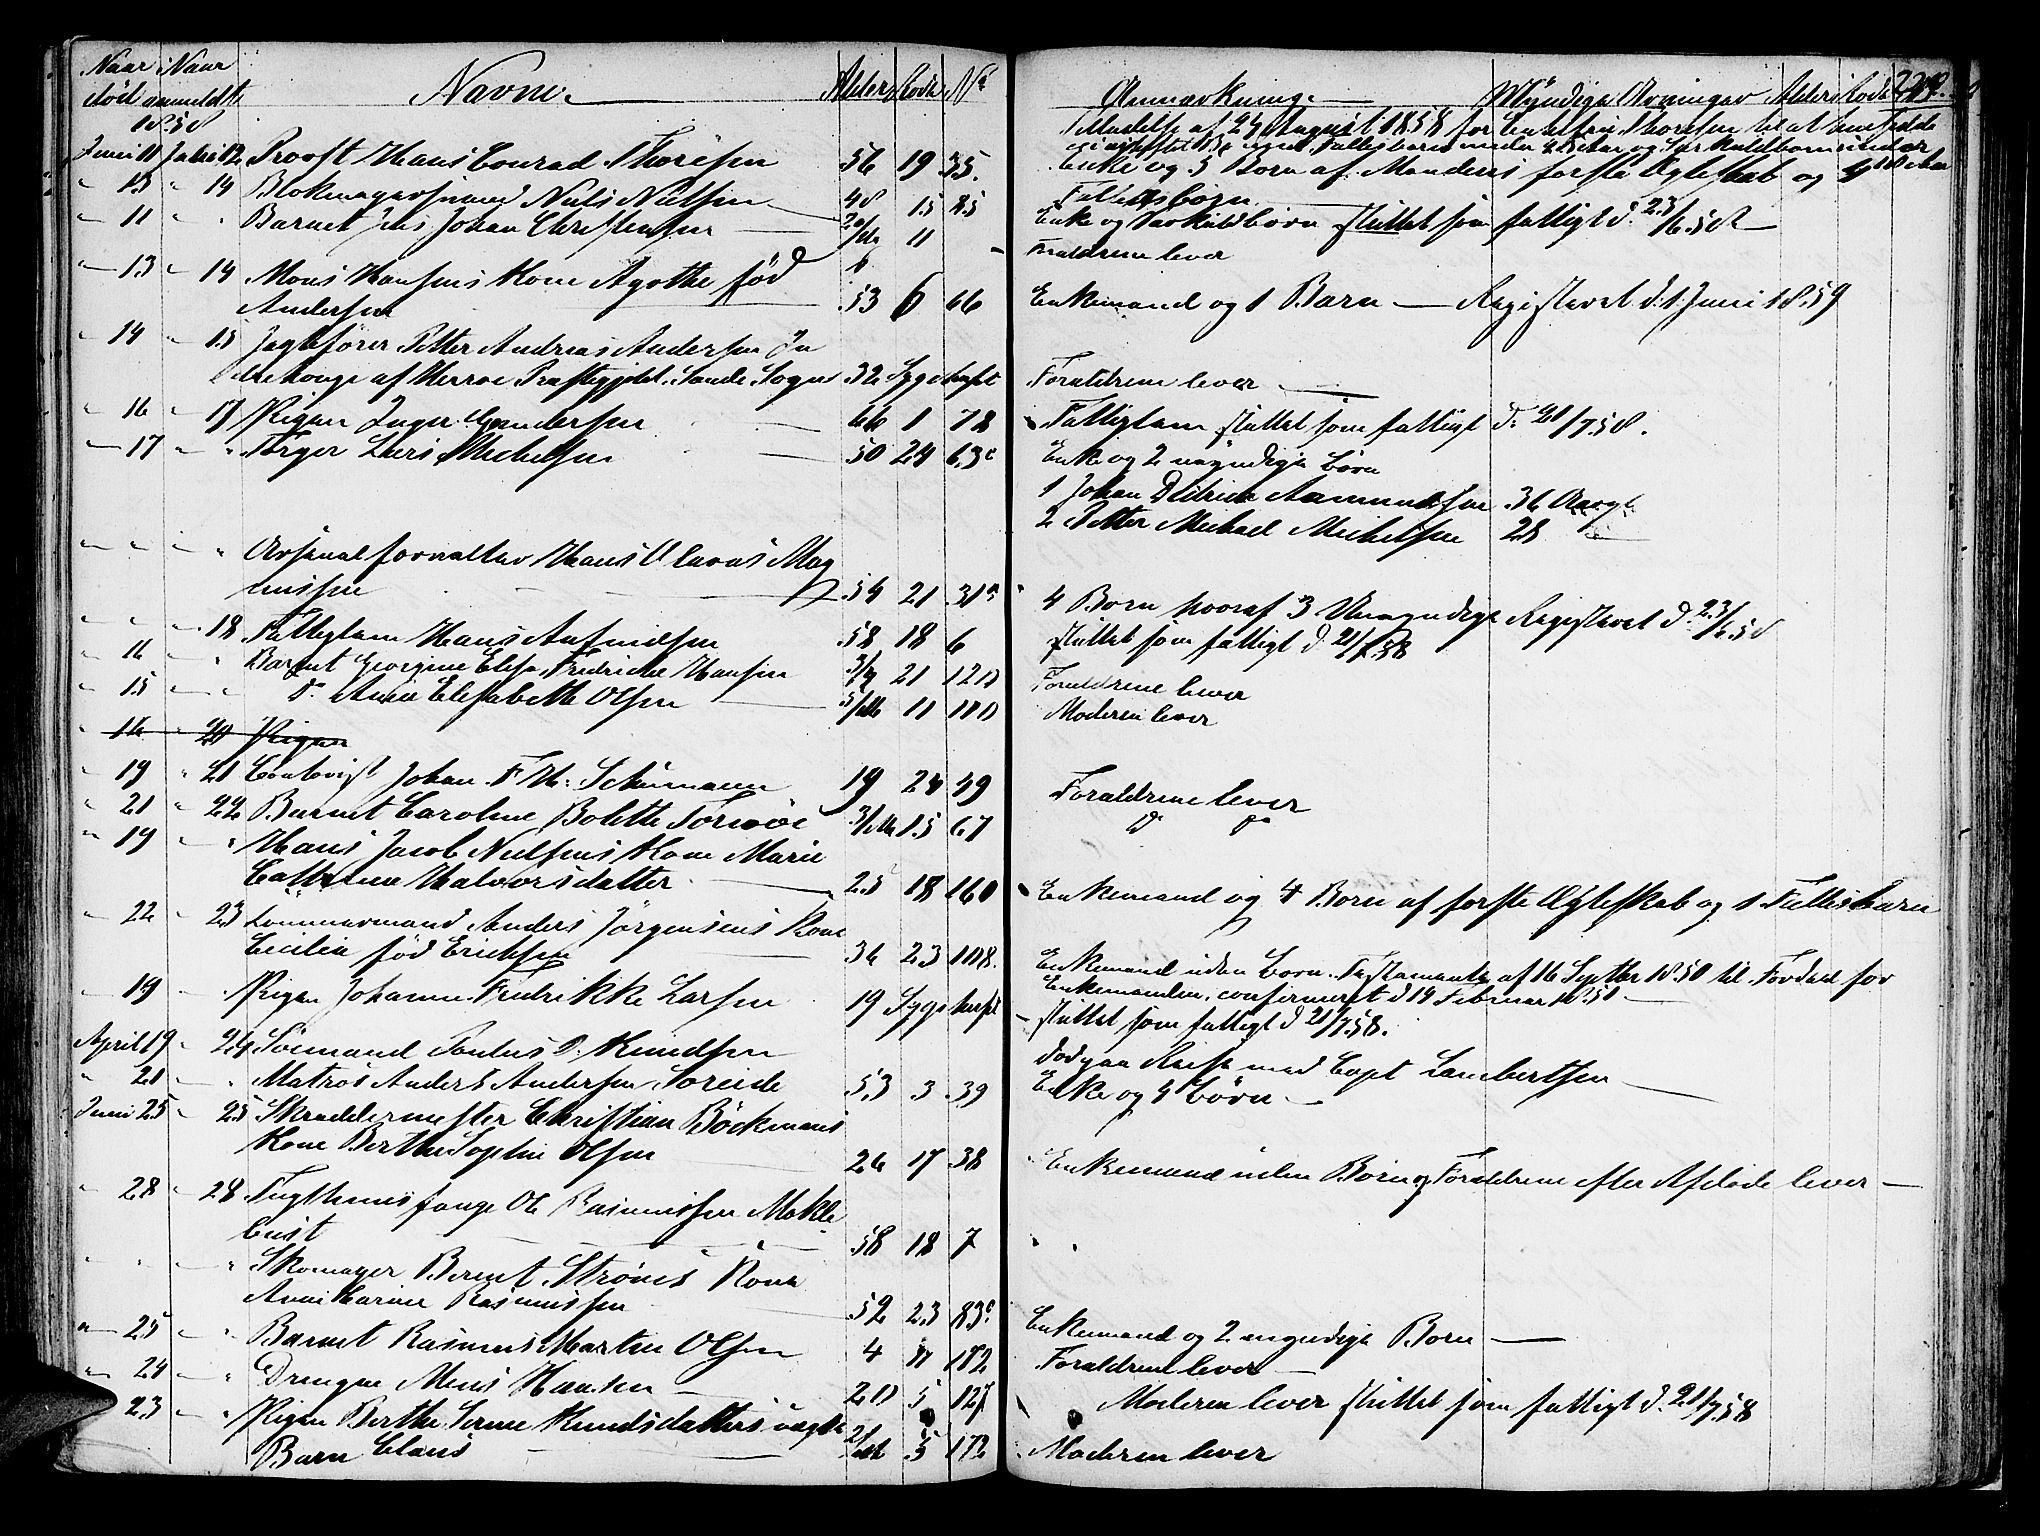 SAB, Byfogd og Byskriver i Bergen, 06/06Na/L0002: Dødsfallsjournaler, 1847-1861, s. 228b-229a